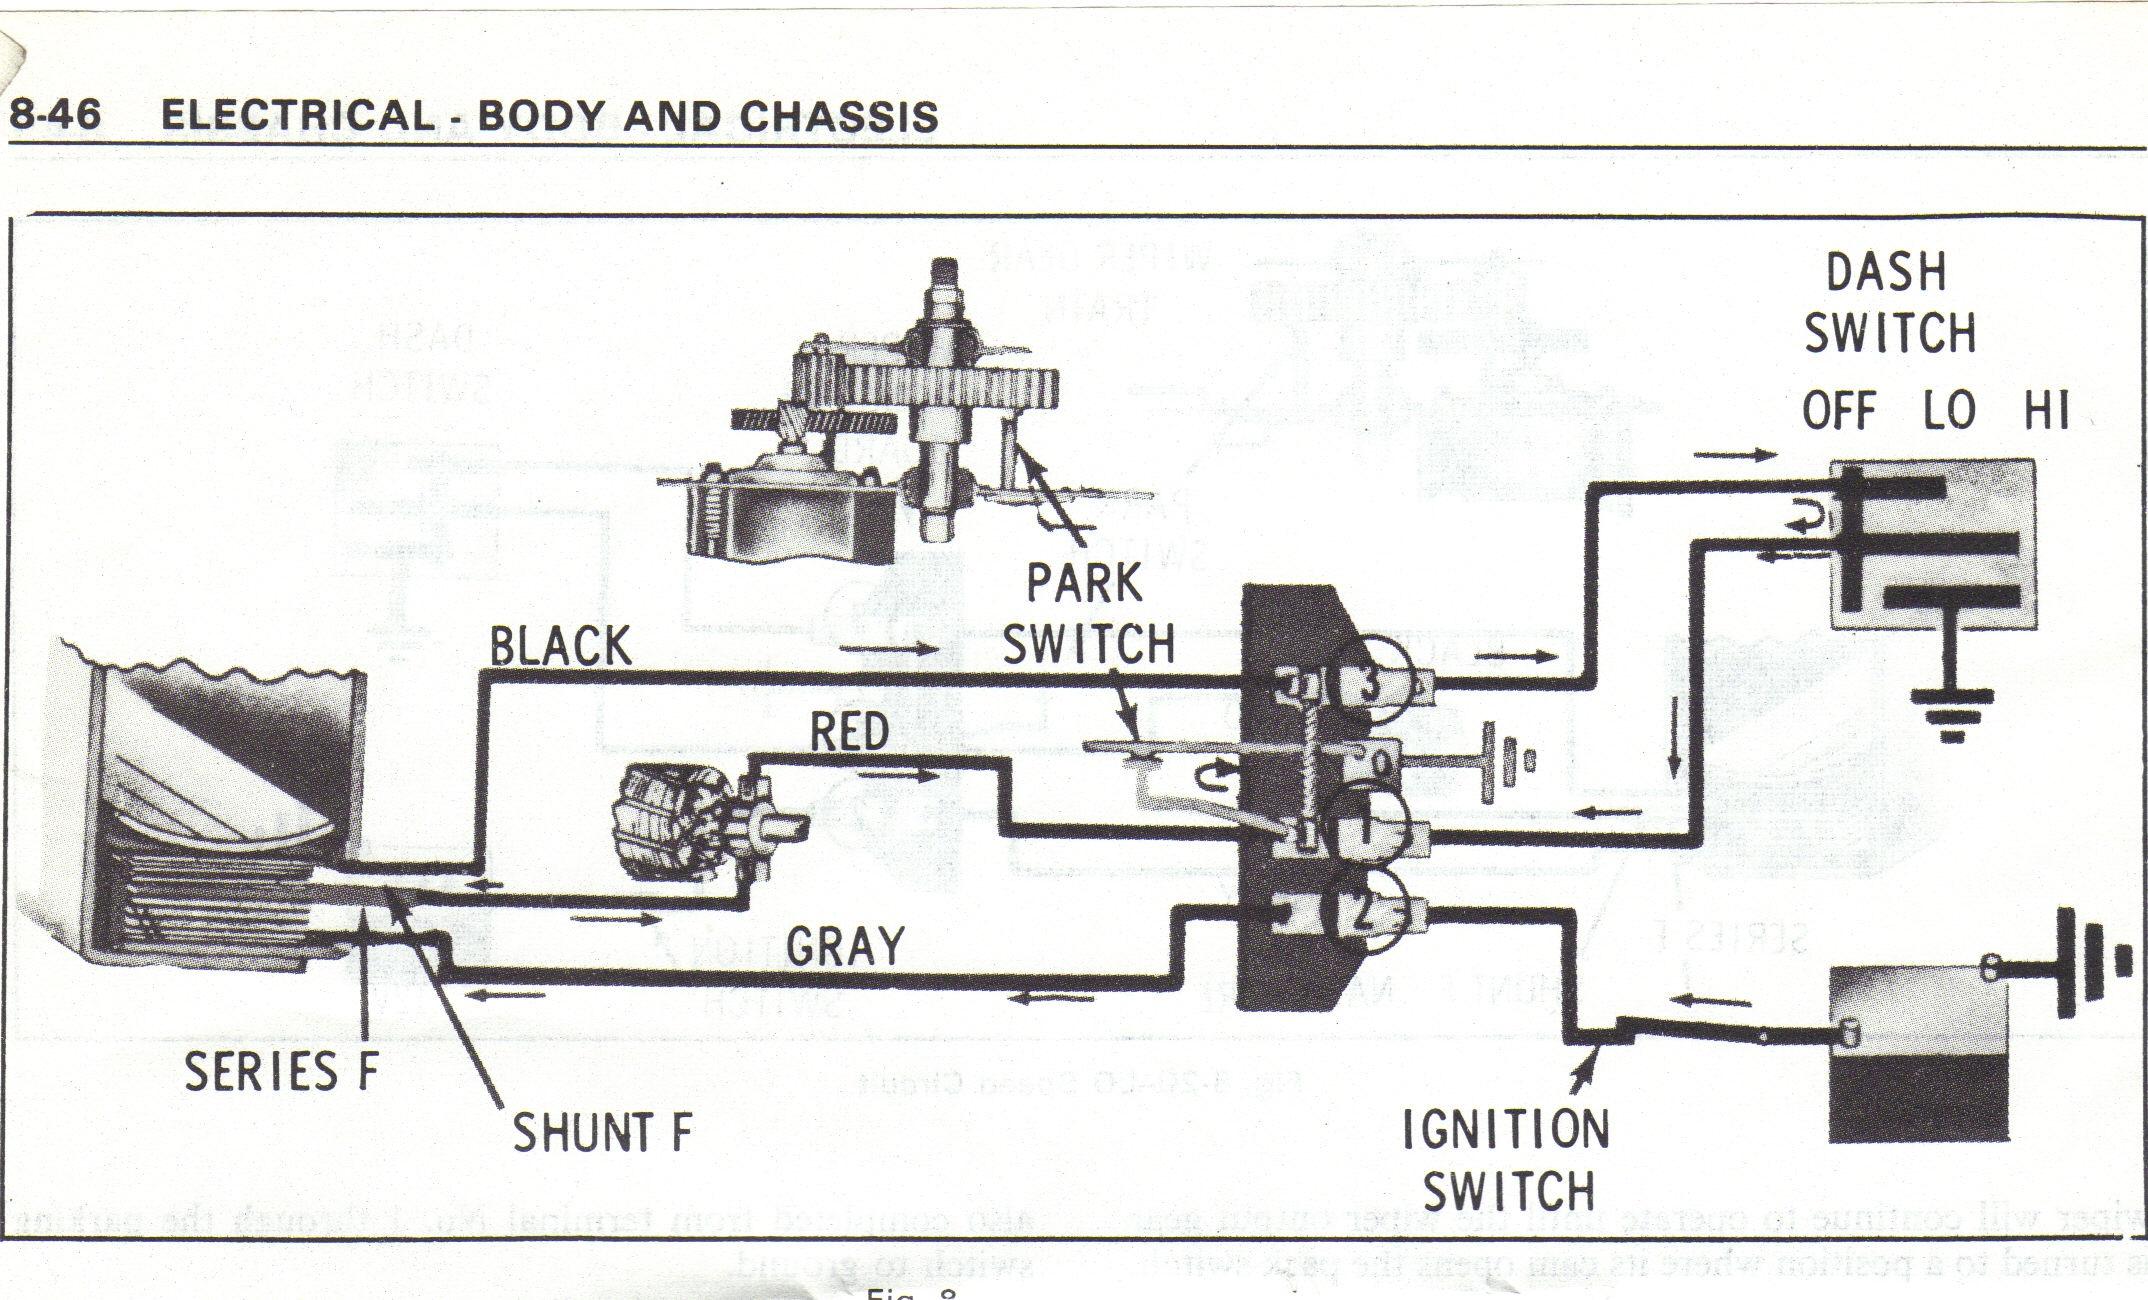 1968 Chevy Wiper Motor Wiring Diagram - Data Wiring Diagram Site - Wiper Motor Wiring Diagram Chevrolet